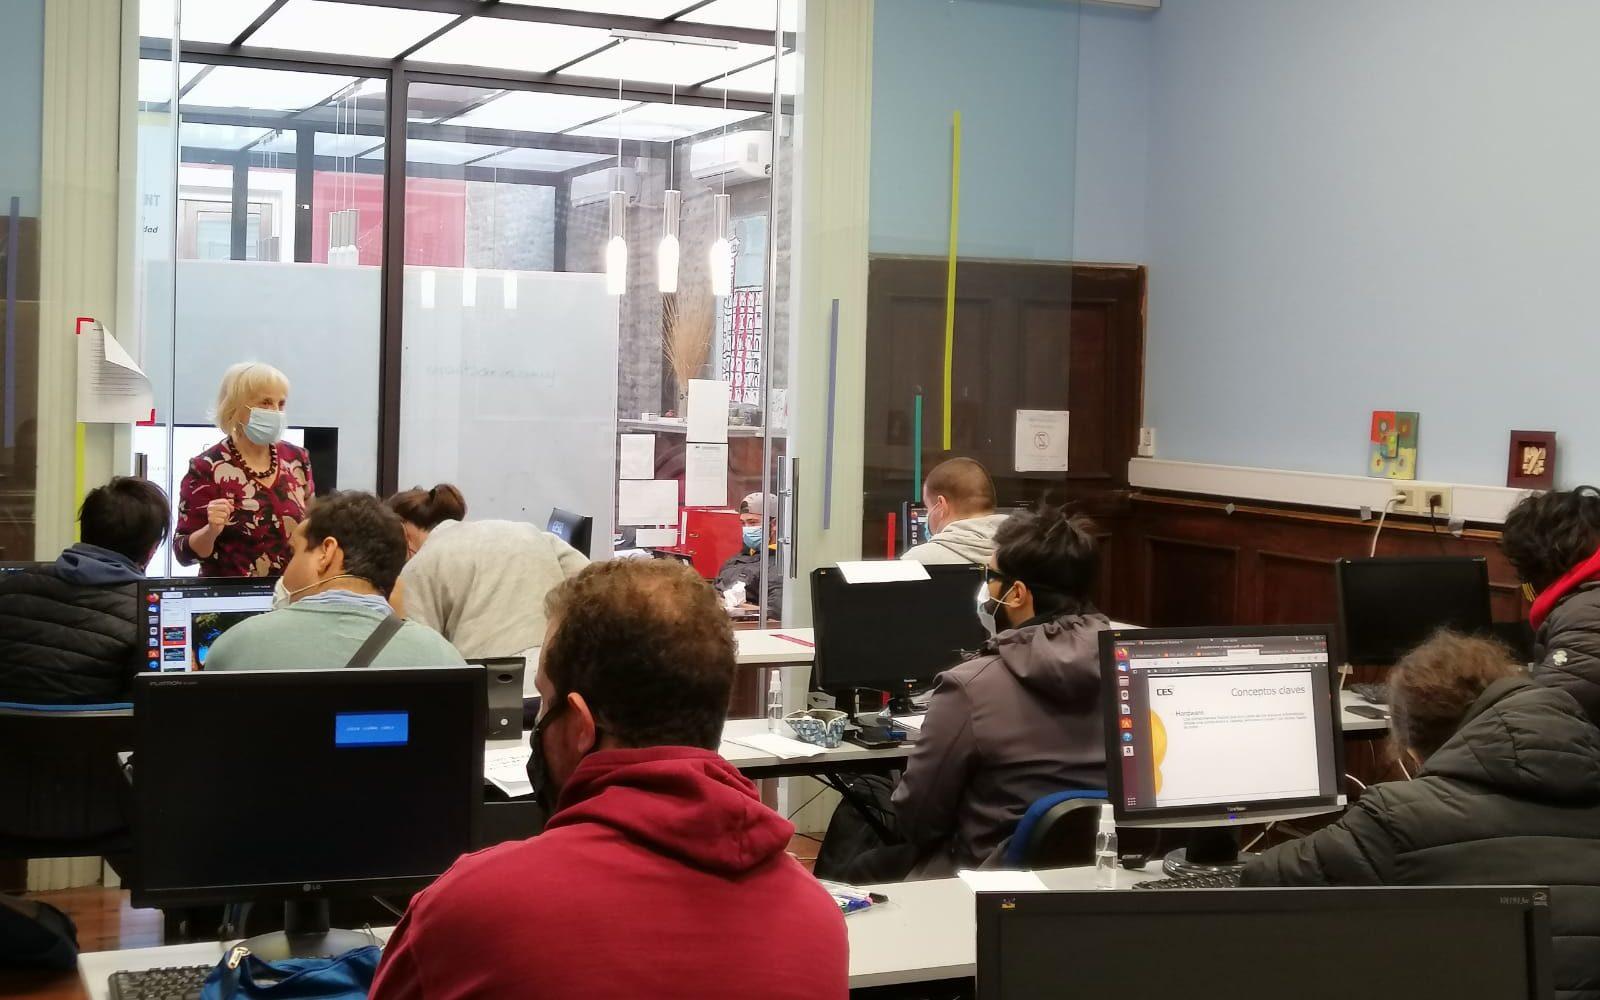 Imagen que contiene interior de salón de clases con estudiantes sentados frente a computadores.